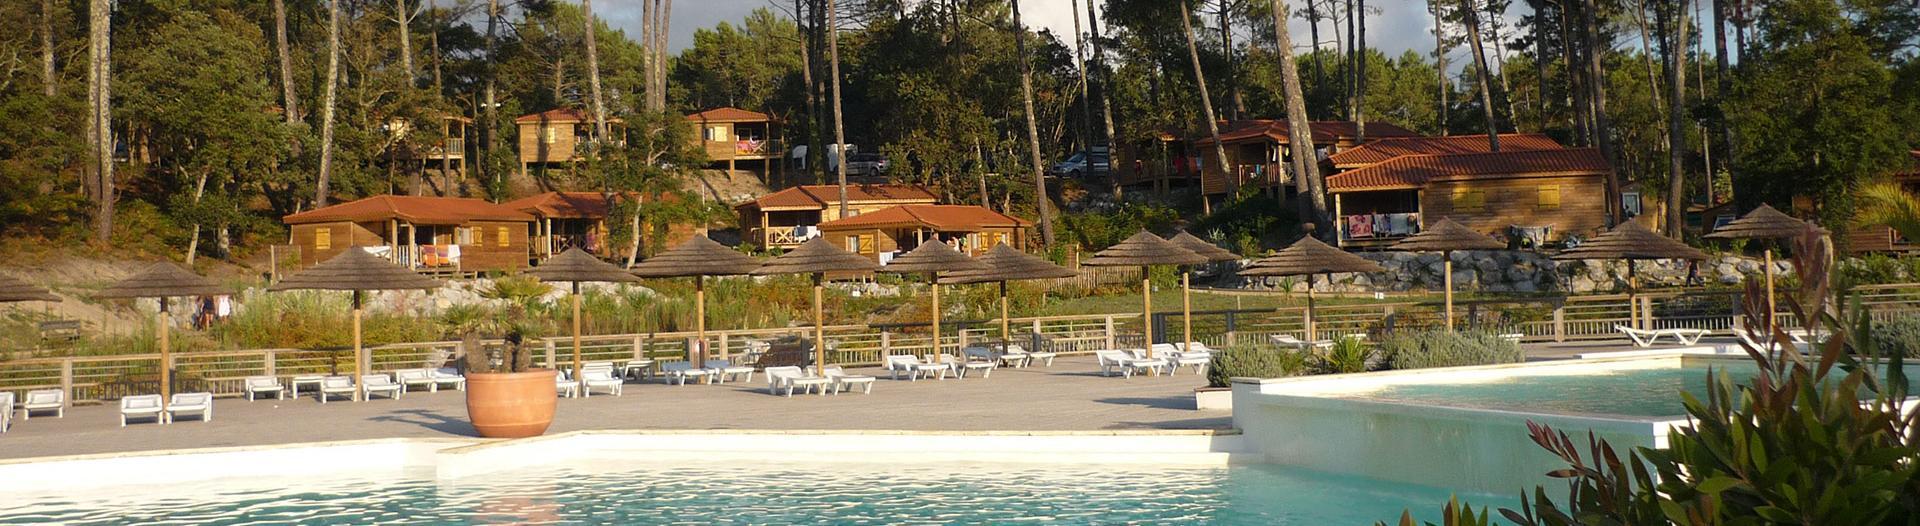 slider-camping-oceliances-piscine